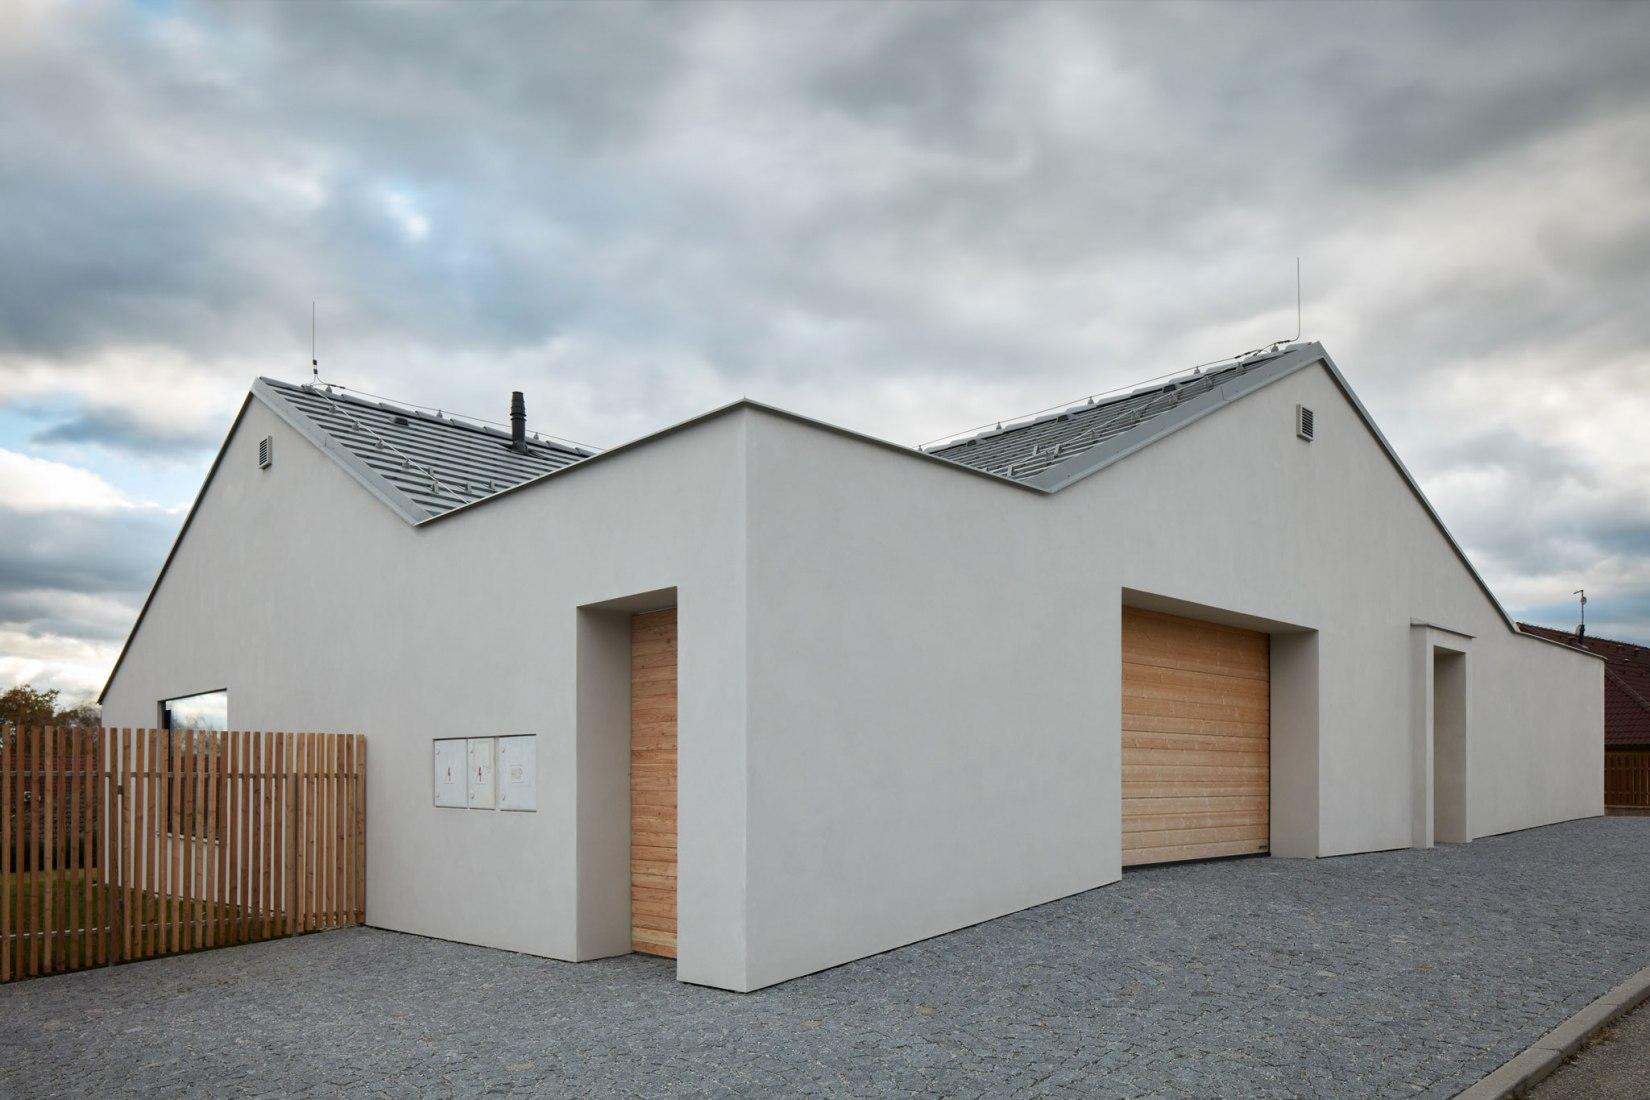 Family house in Litvínovice by Atelier 111 architekti. Photograph by ©BoysPlayNice / Jakub Skokan, Martin Tuma.